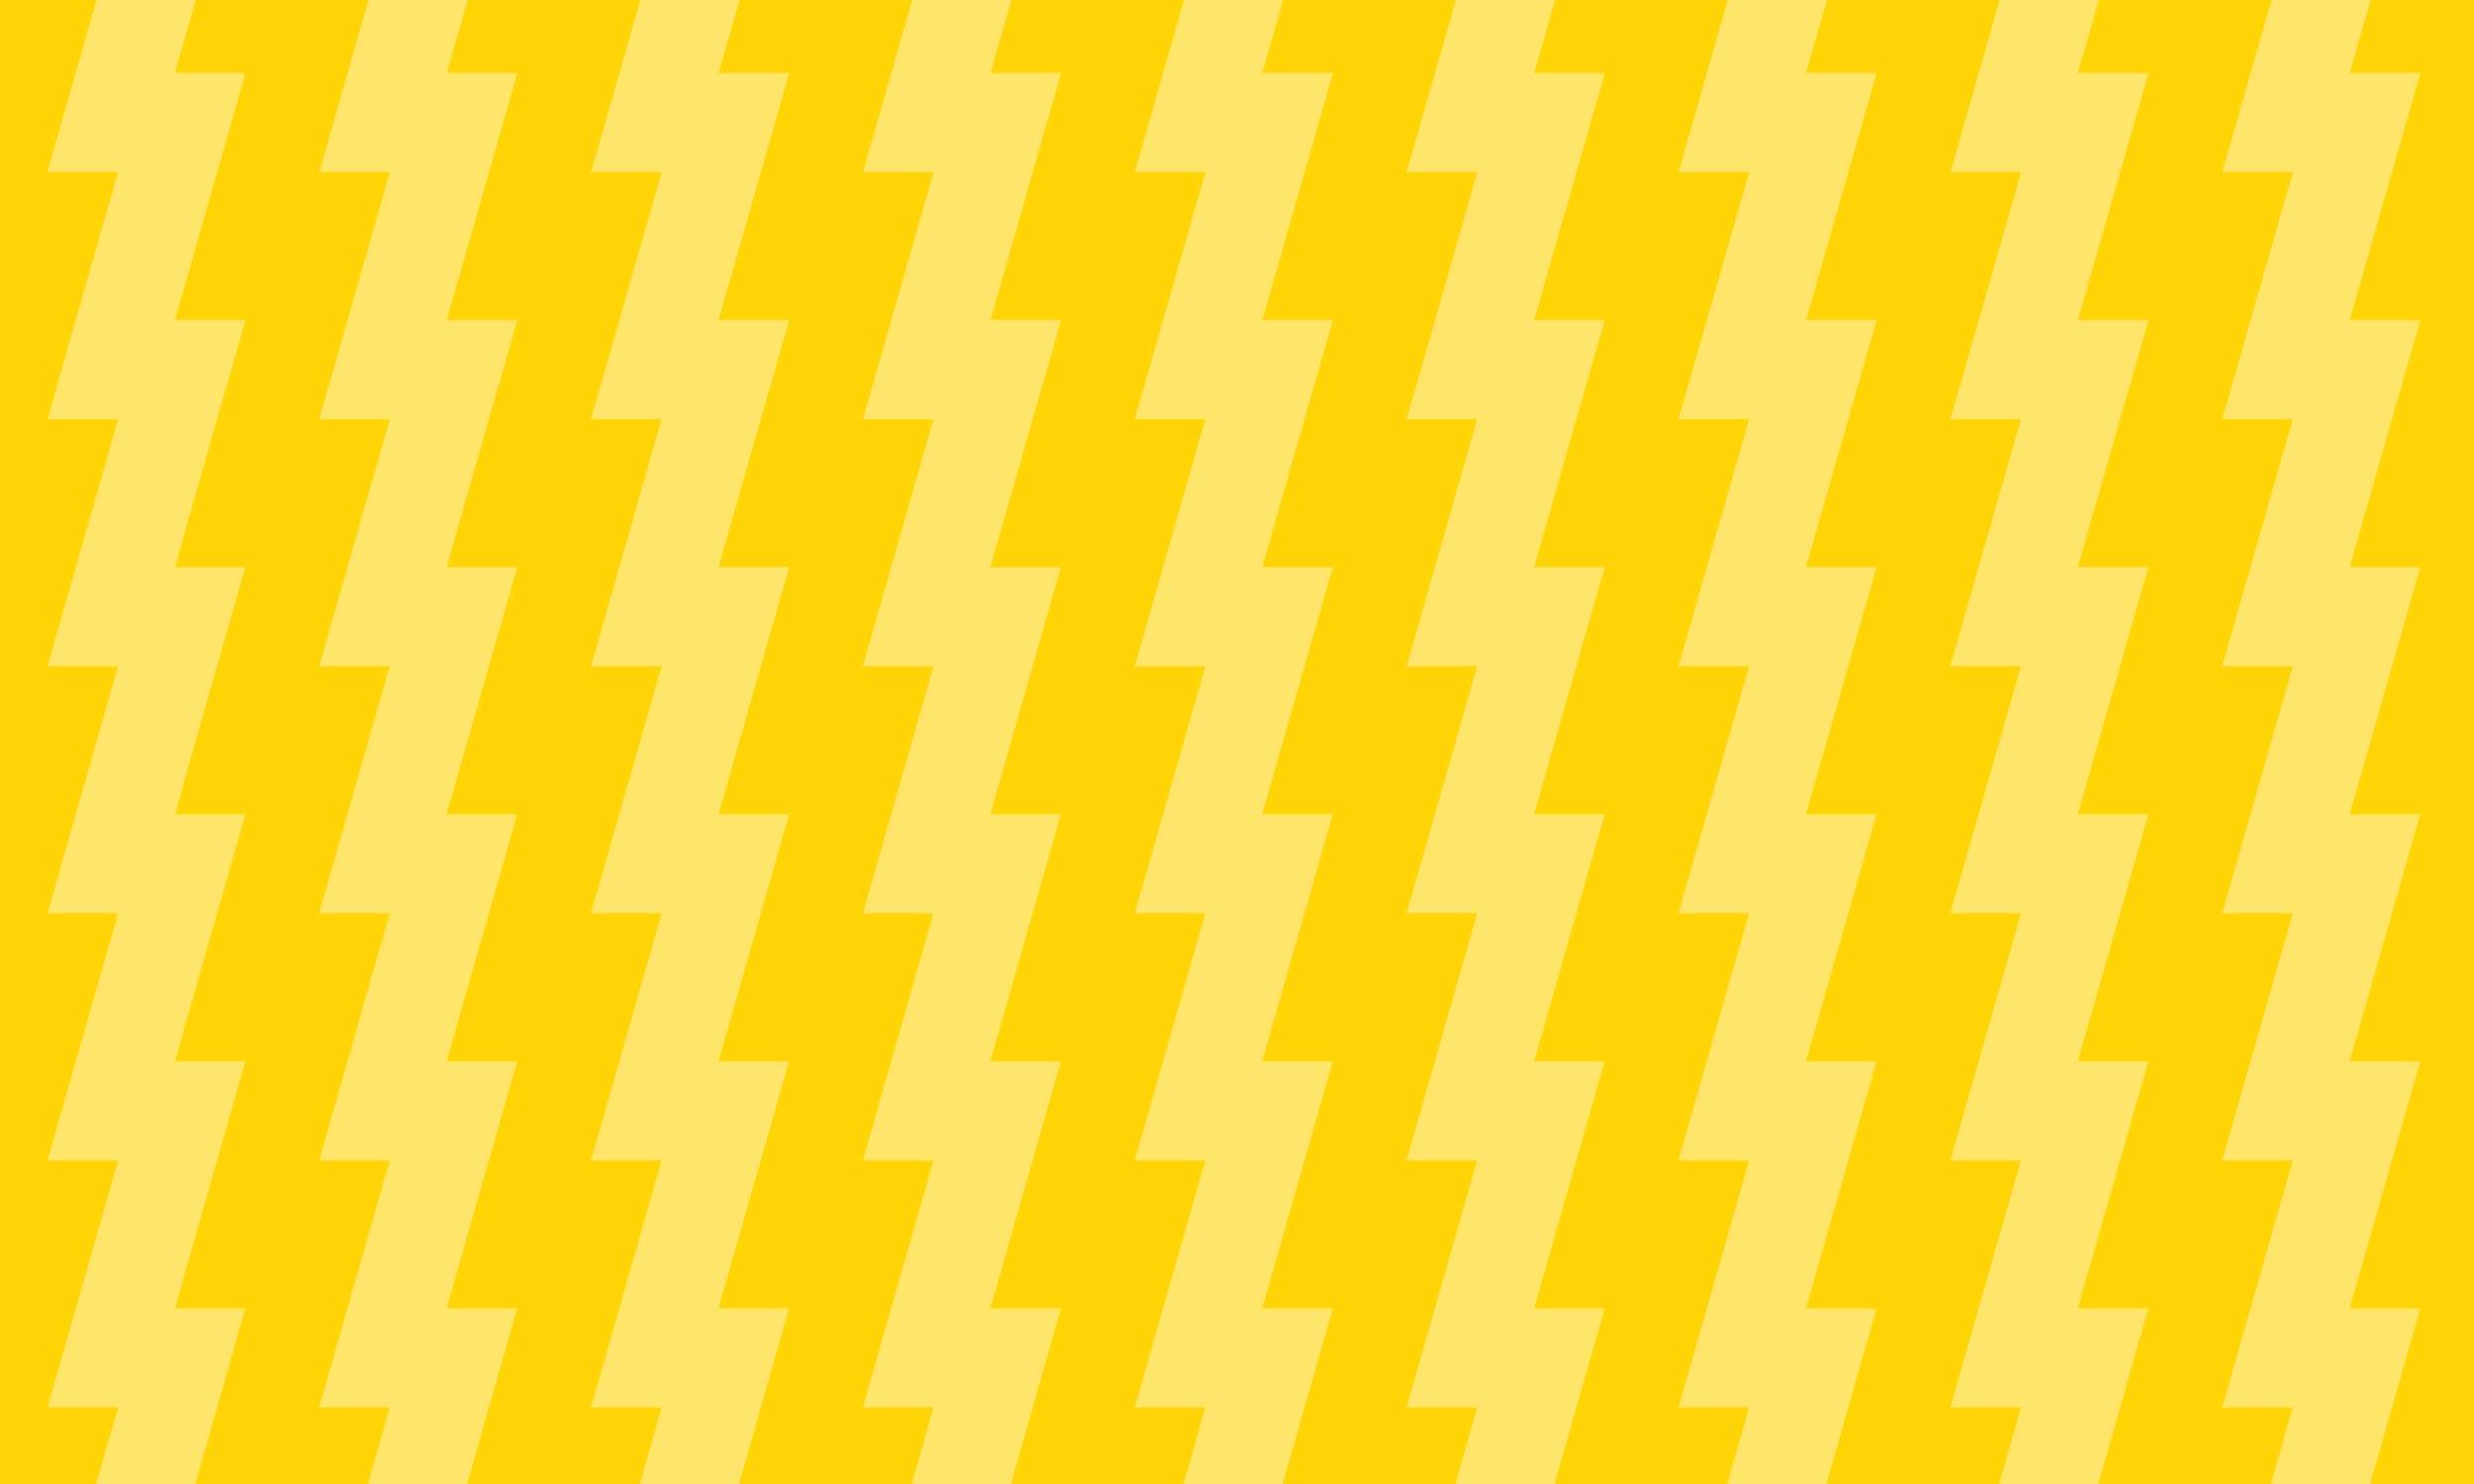 Yellow lightning pattern